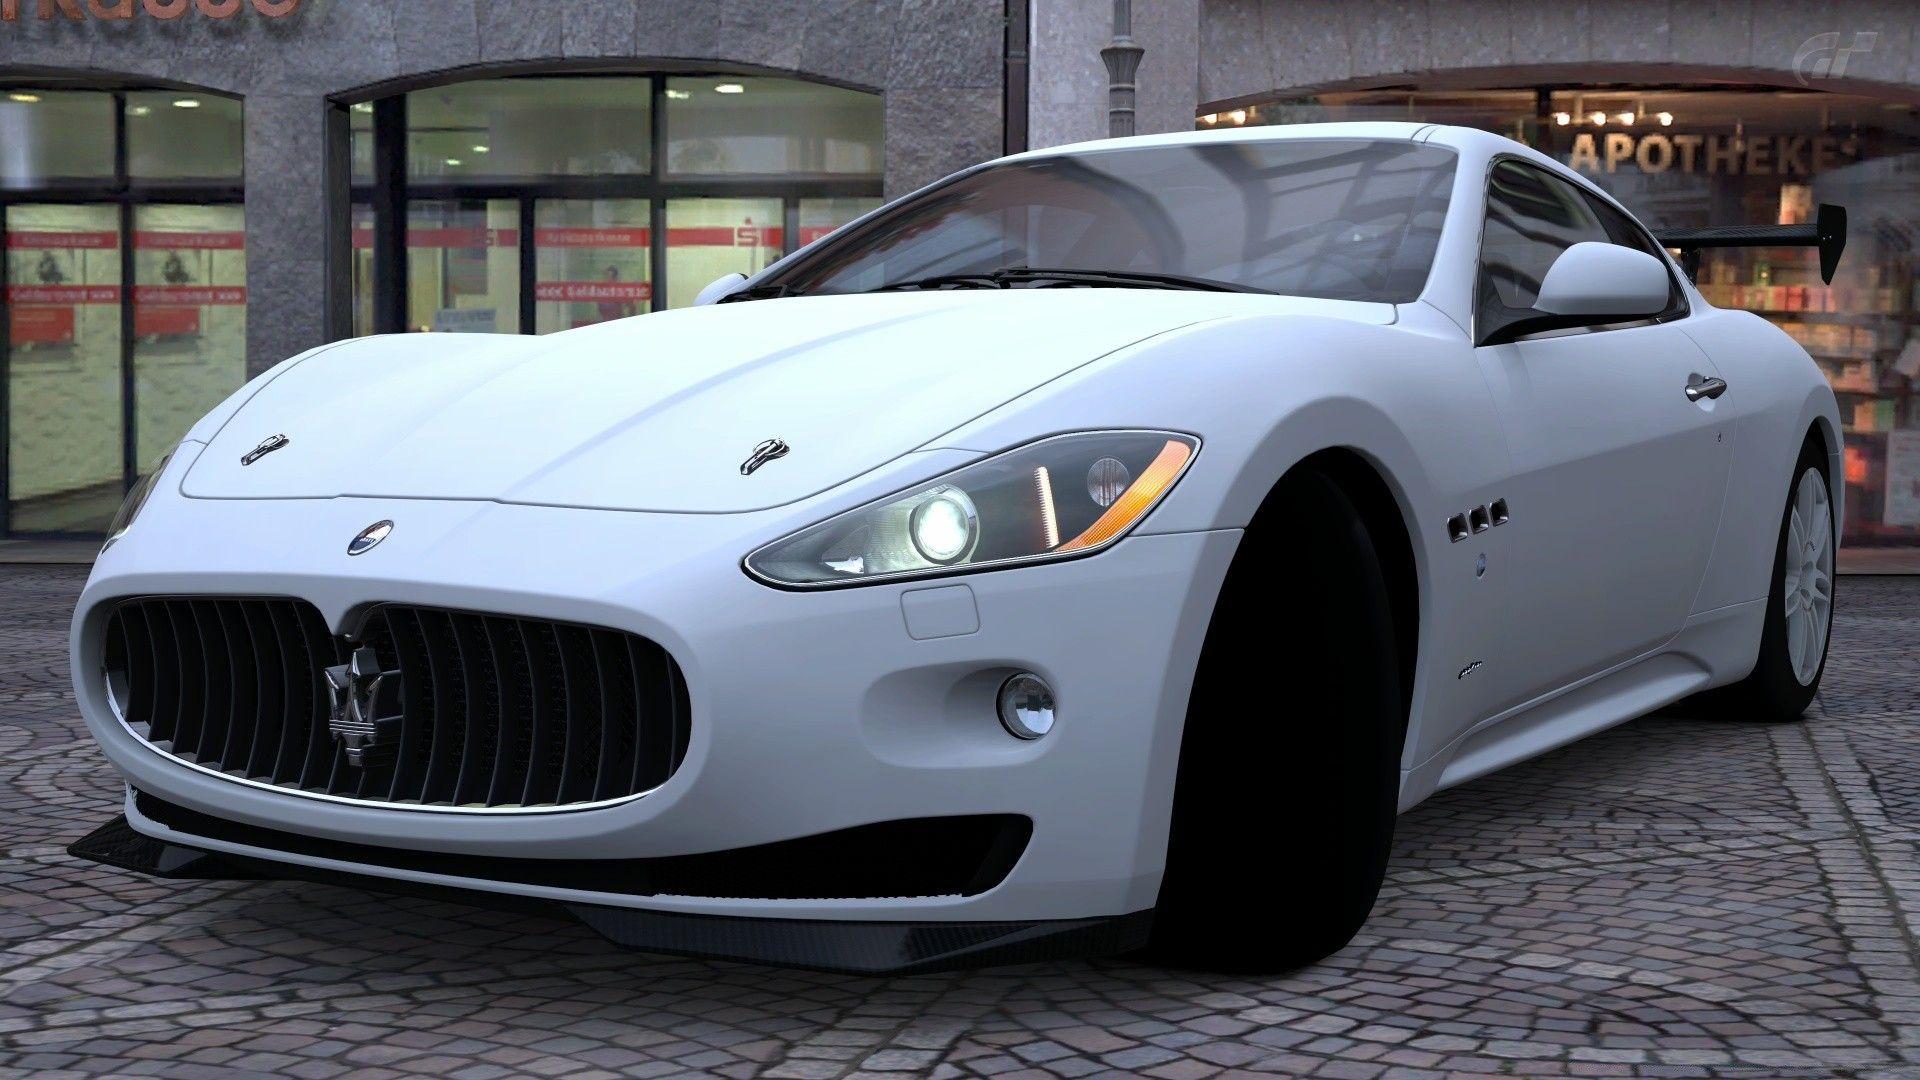 Maserati Granturismo On Rabstol